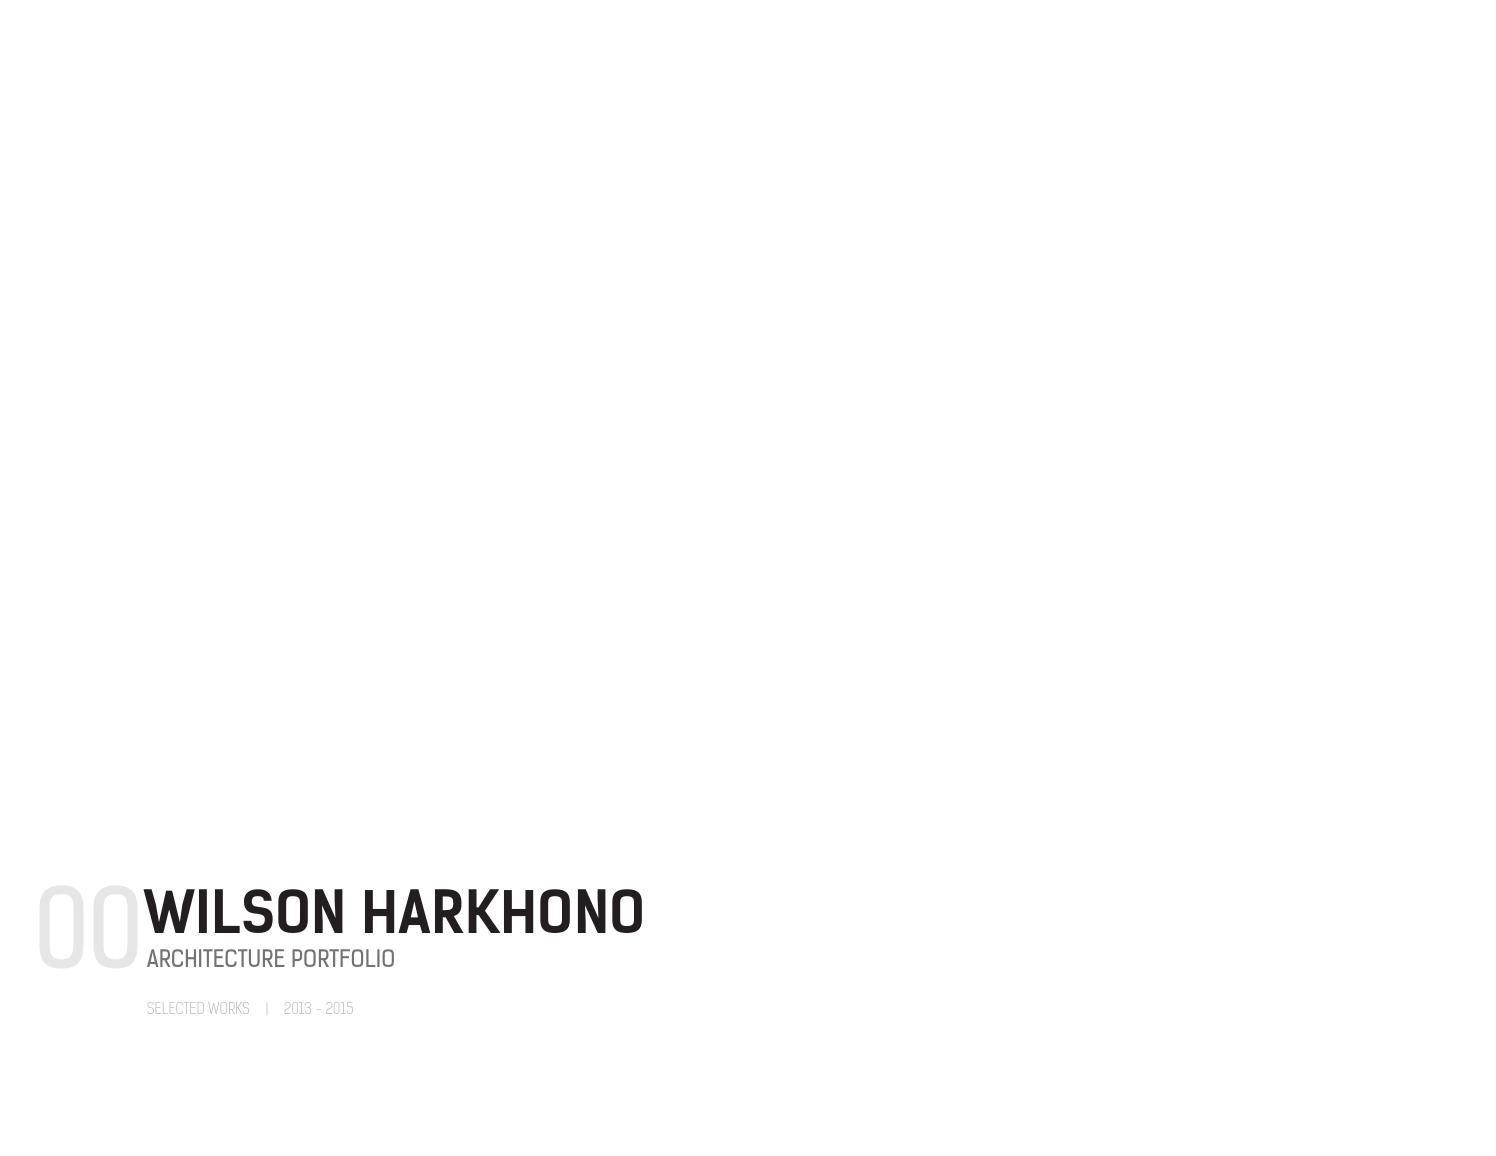 Architecture Portfolio - Graduate School Application